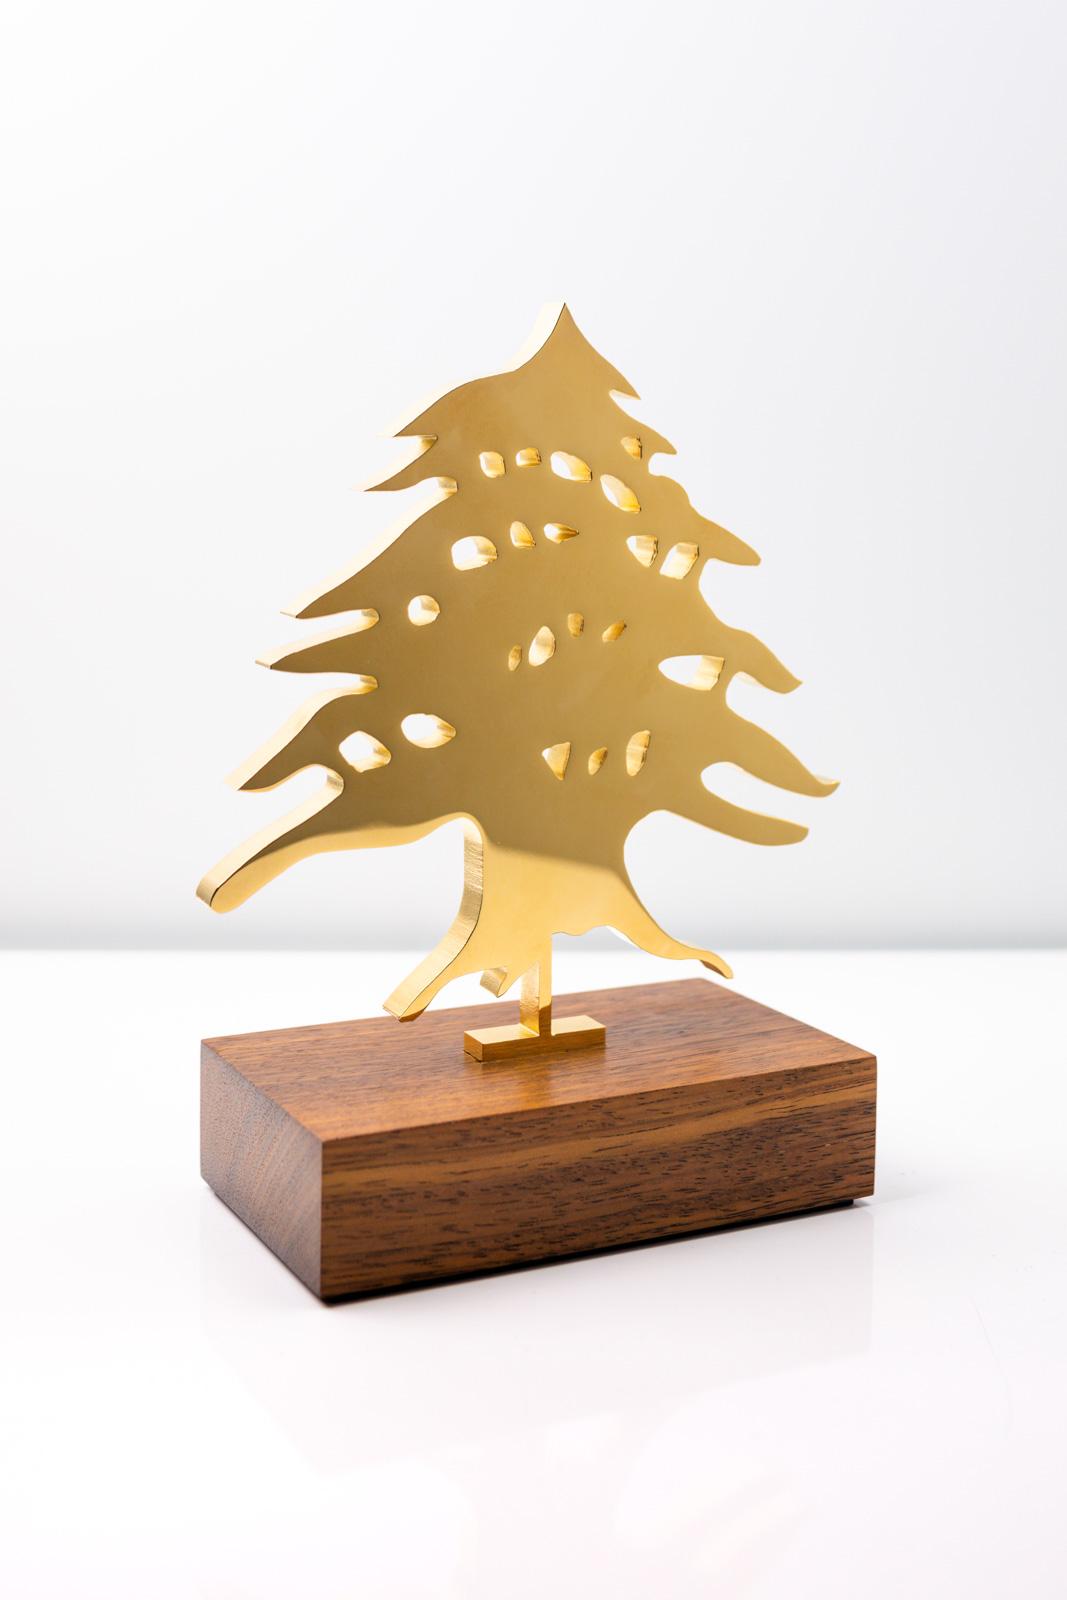 George Khouzame Lebanon Award